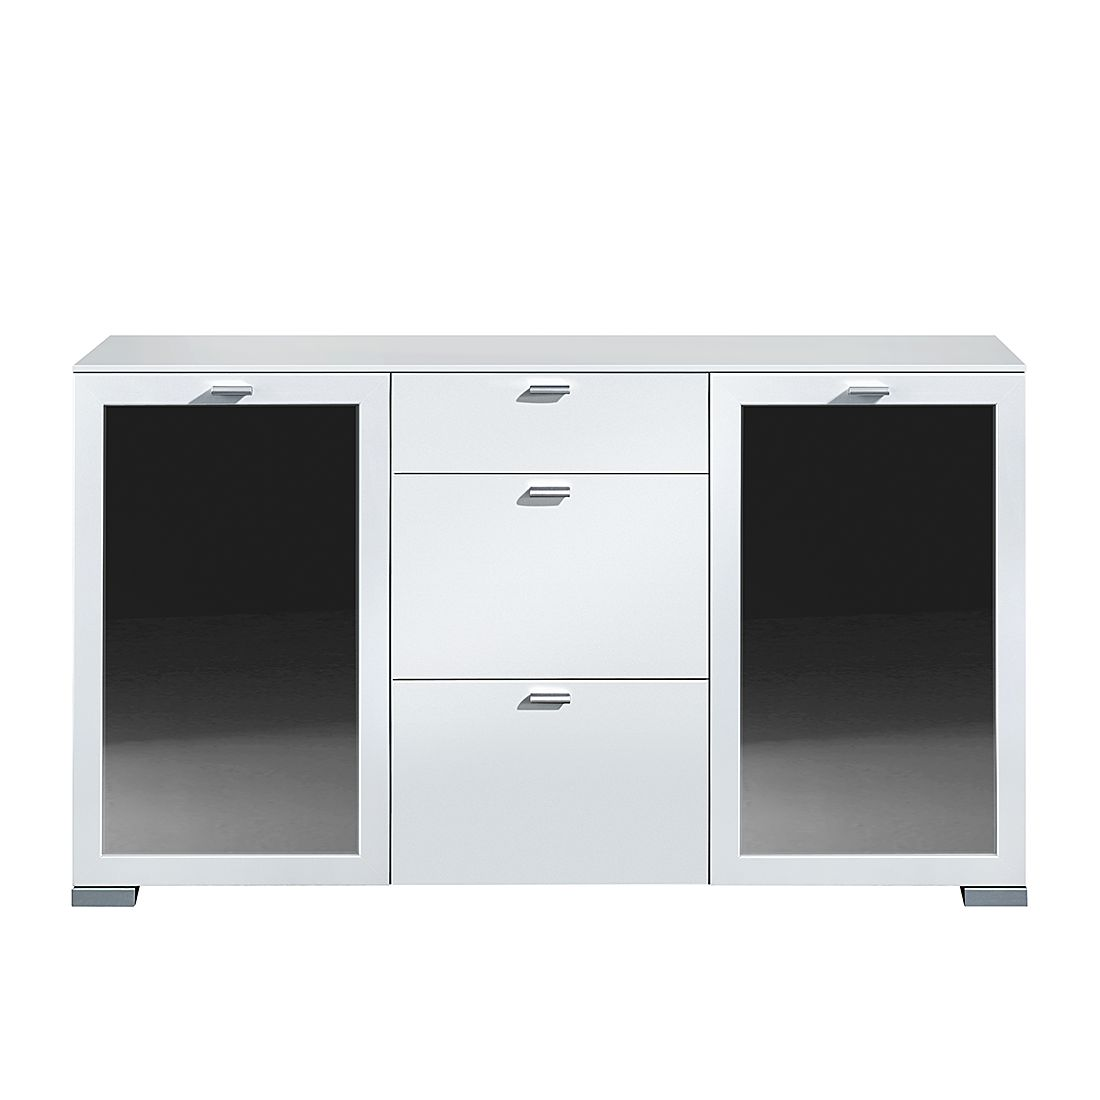 arte m archive seite 4 von 64. Black Bedroom Furniture Sets. Home Design Ideas